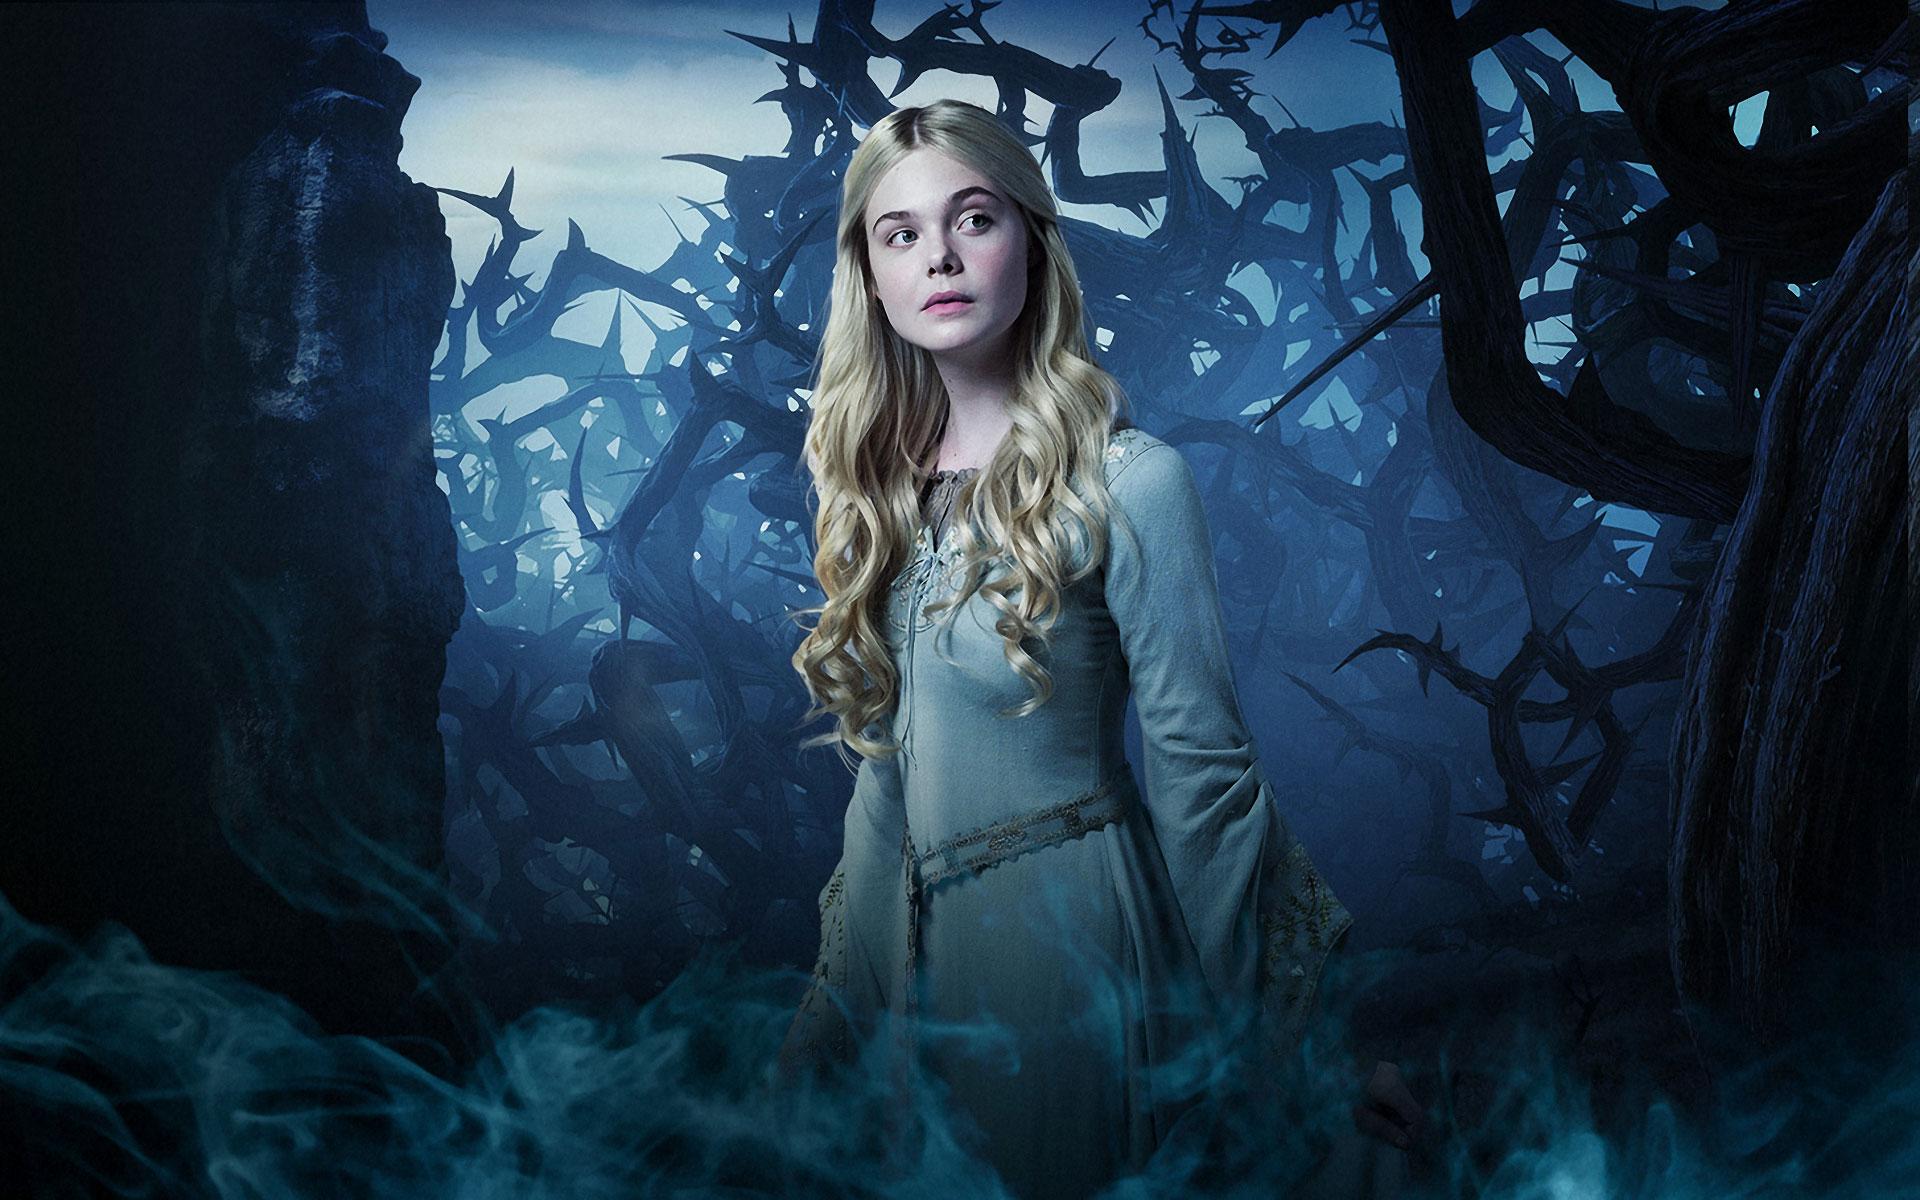 Elle Fanning as Princess Aurora in Maleficent (2014)